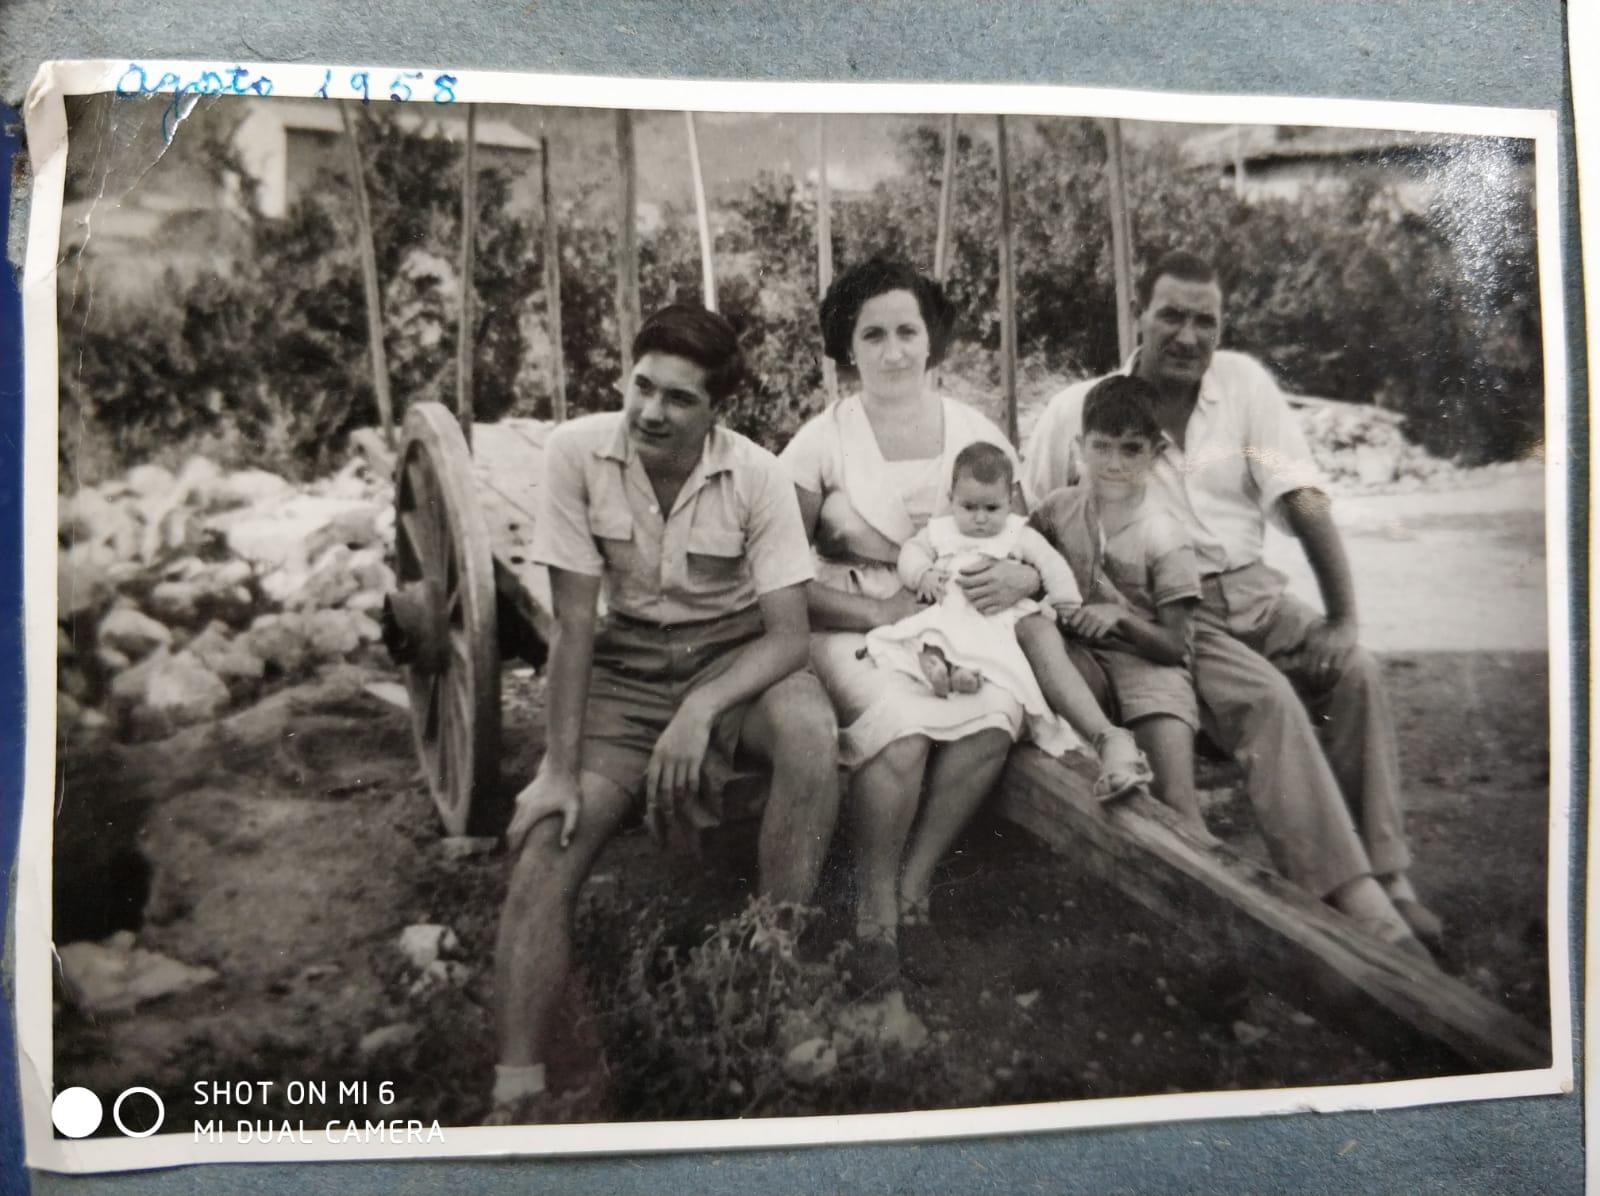 Familia de mi Ama Gómez Acedo - Fernandez - Años 60